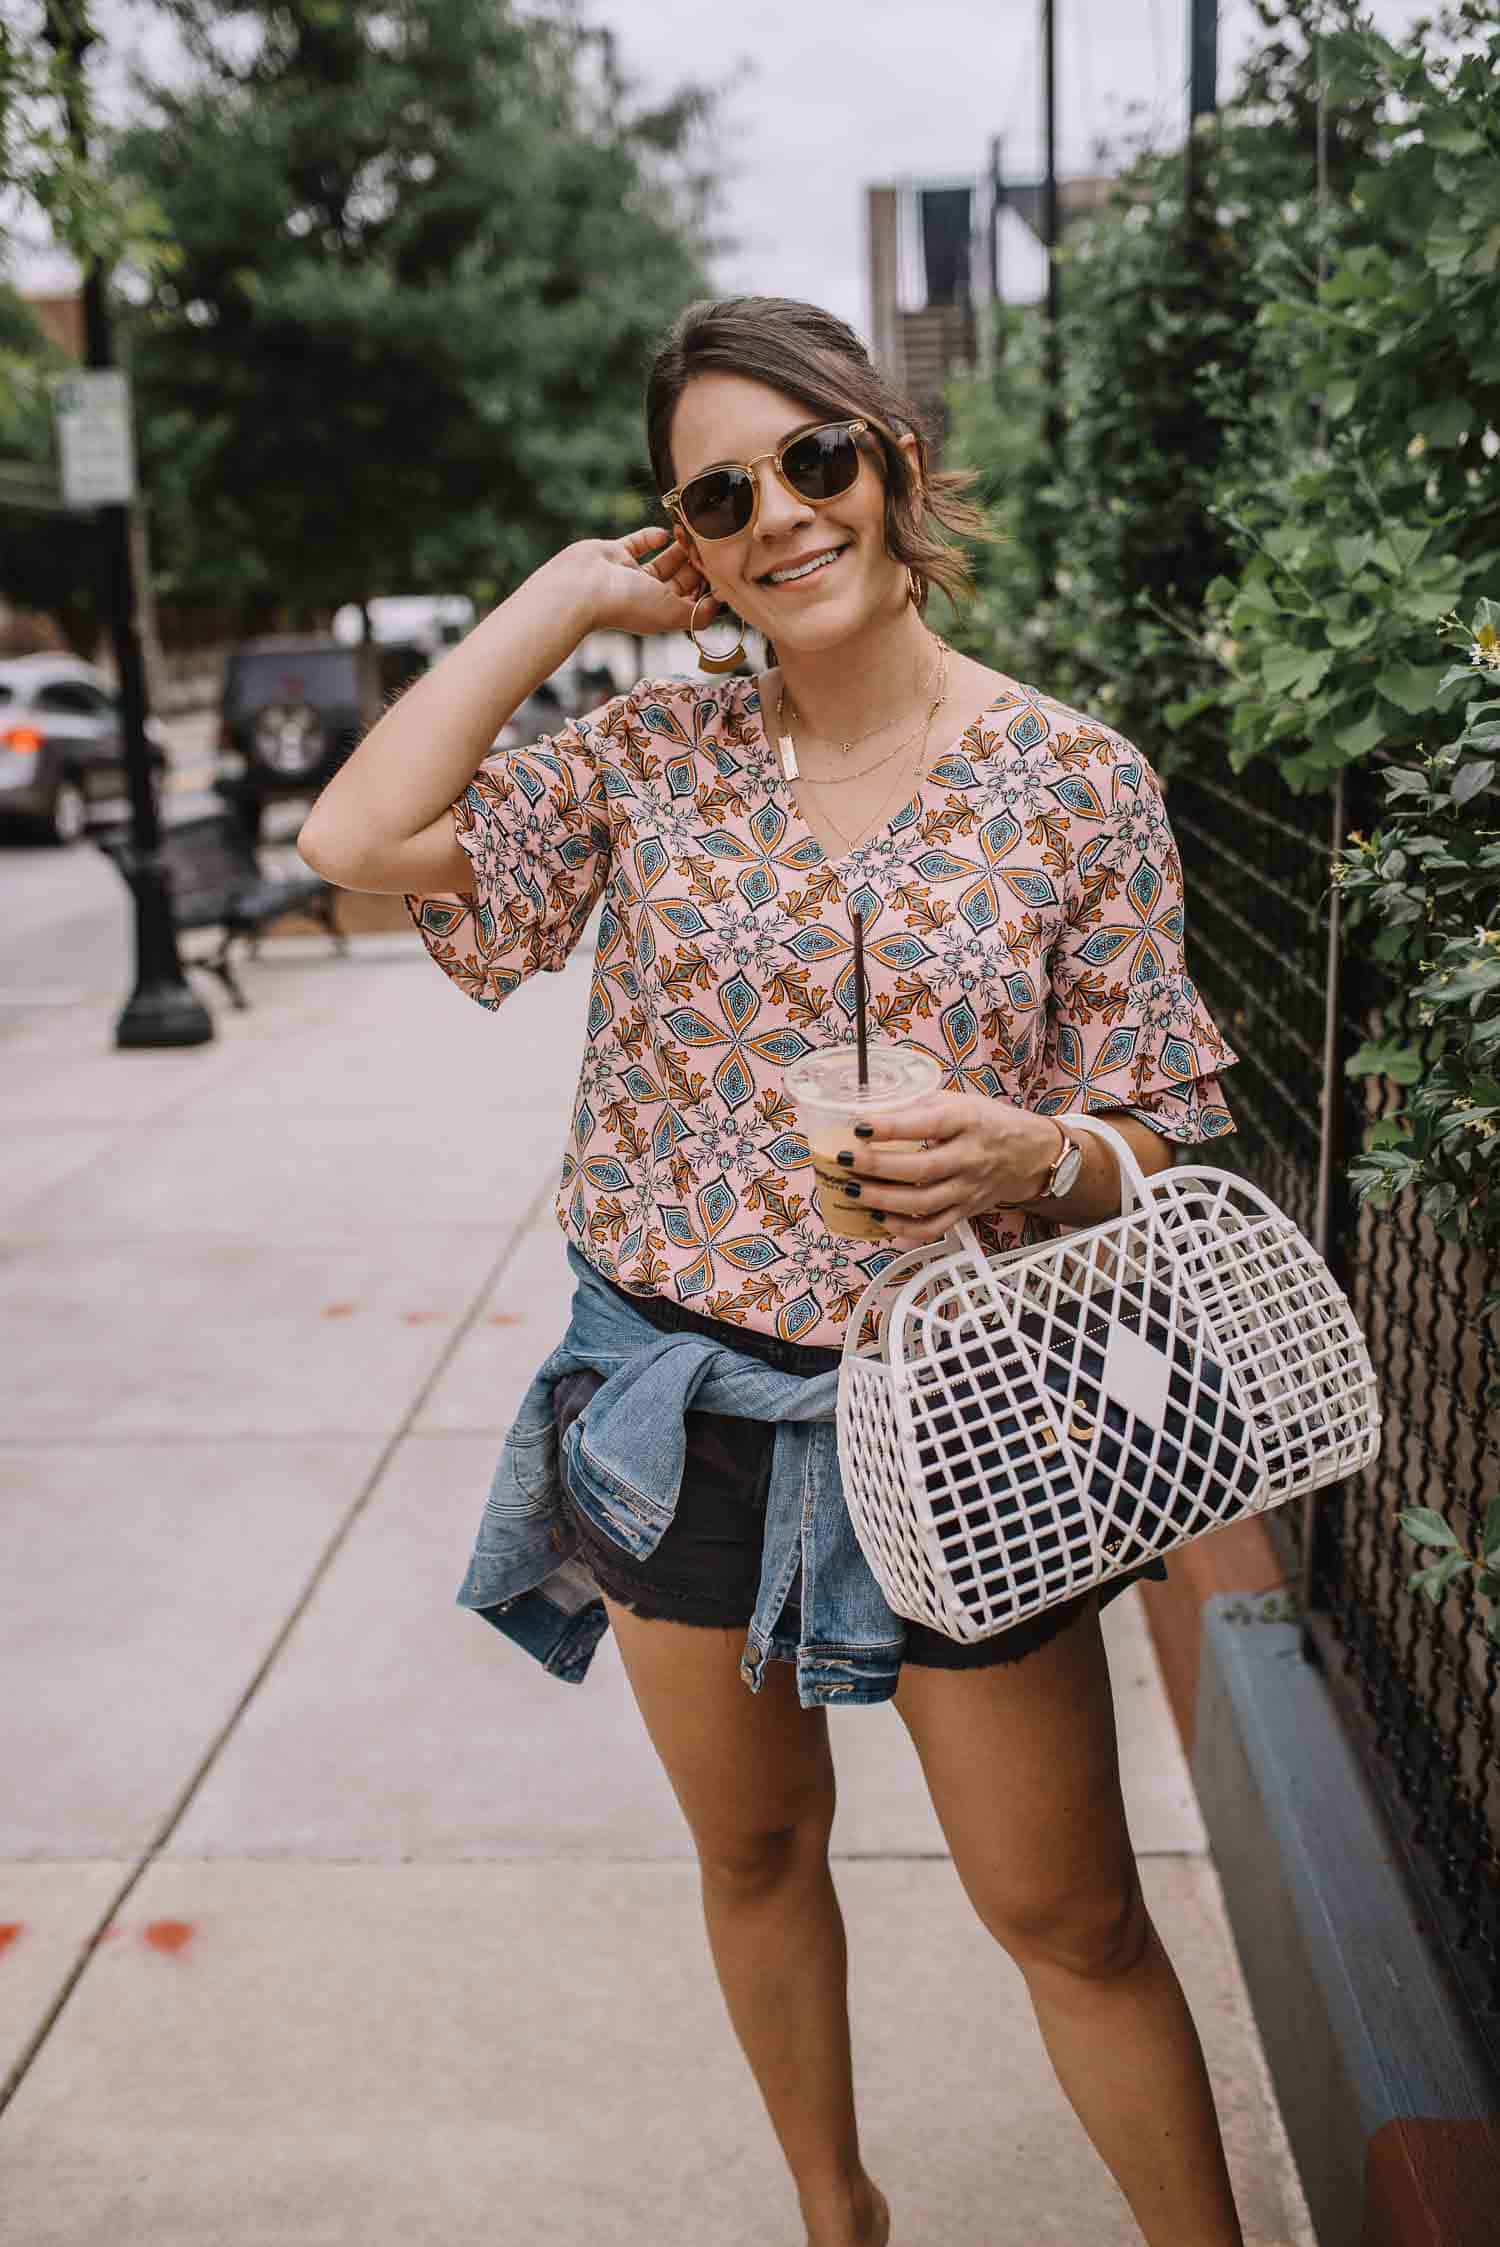 LOFT Kaleidoscope Top, summer tops for the office - My Style Vita